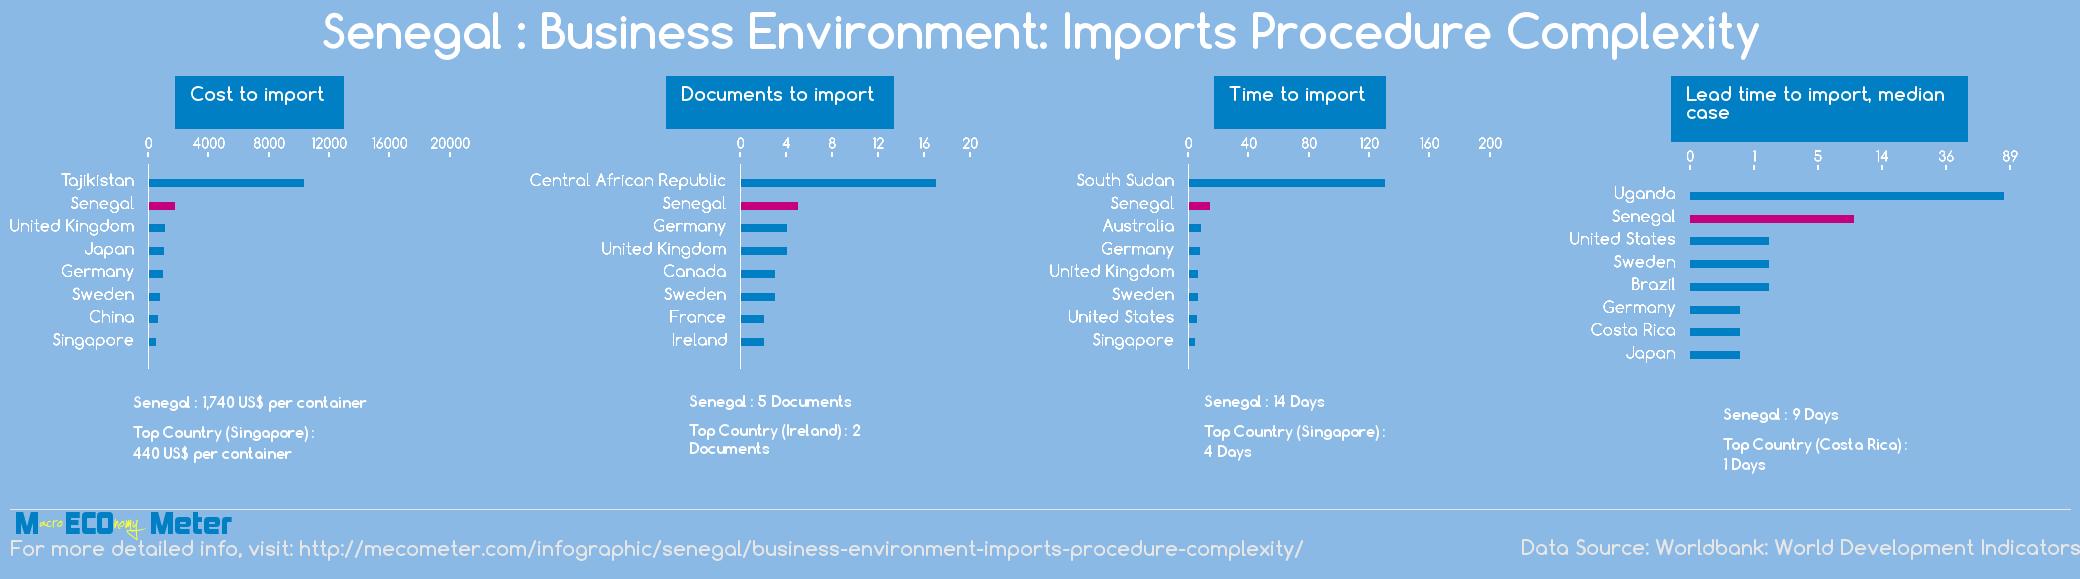 Senegal : Business Environment: Imports Procedure Complexity